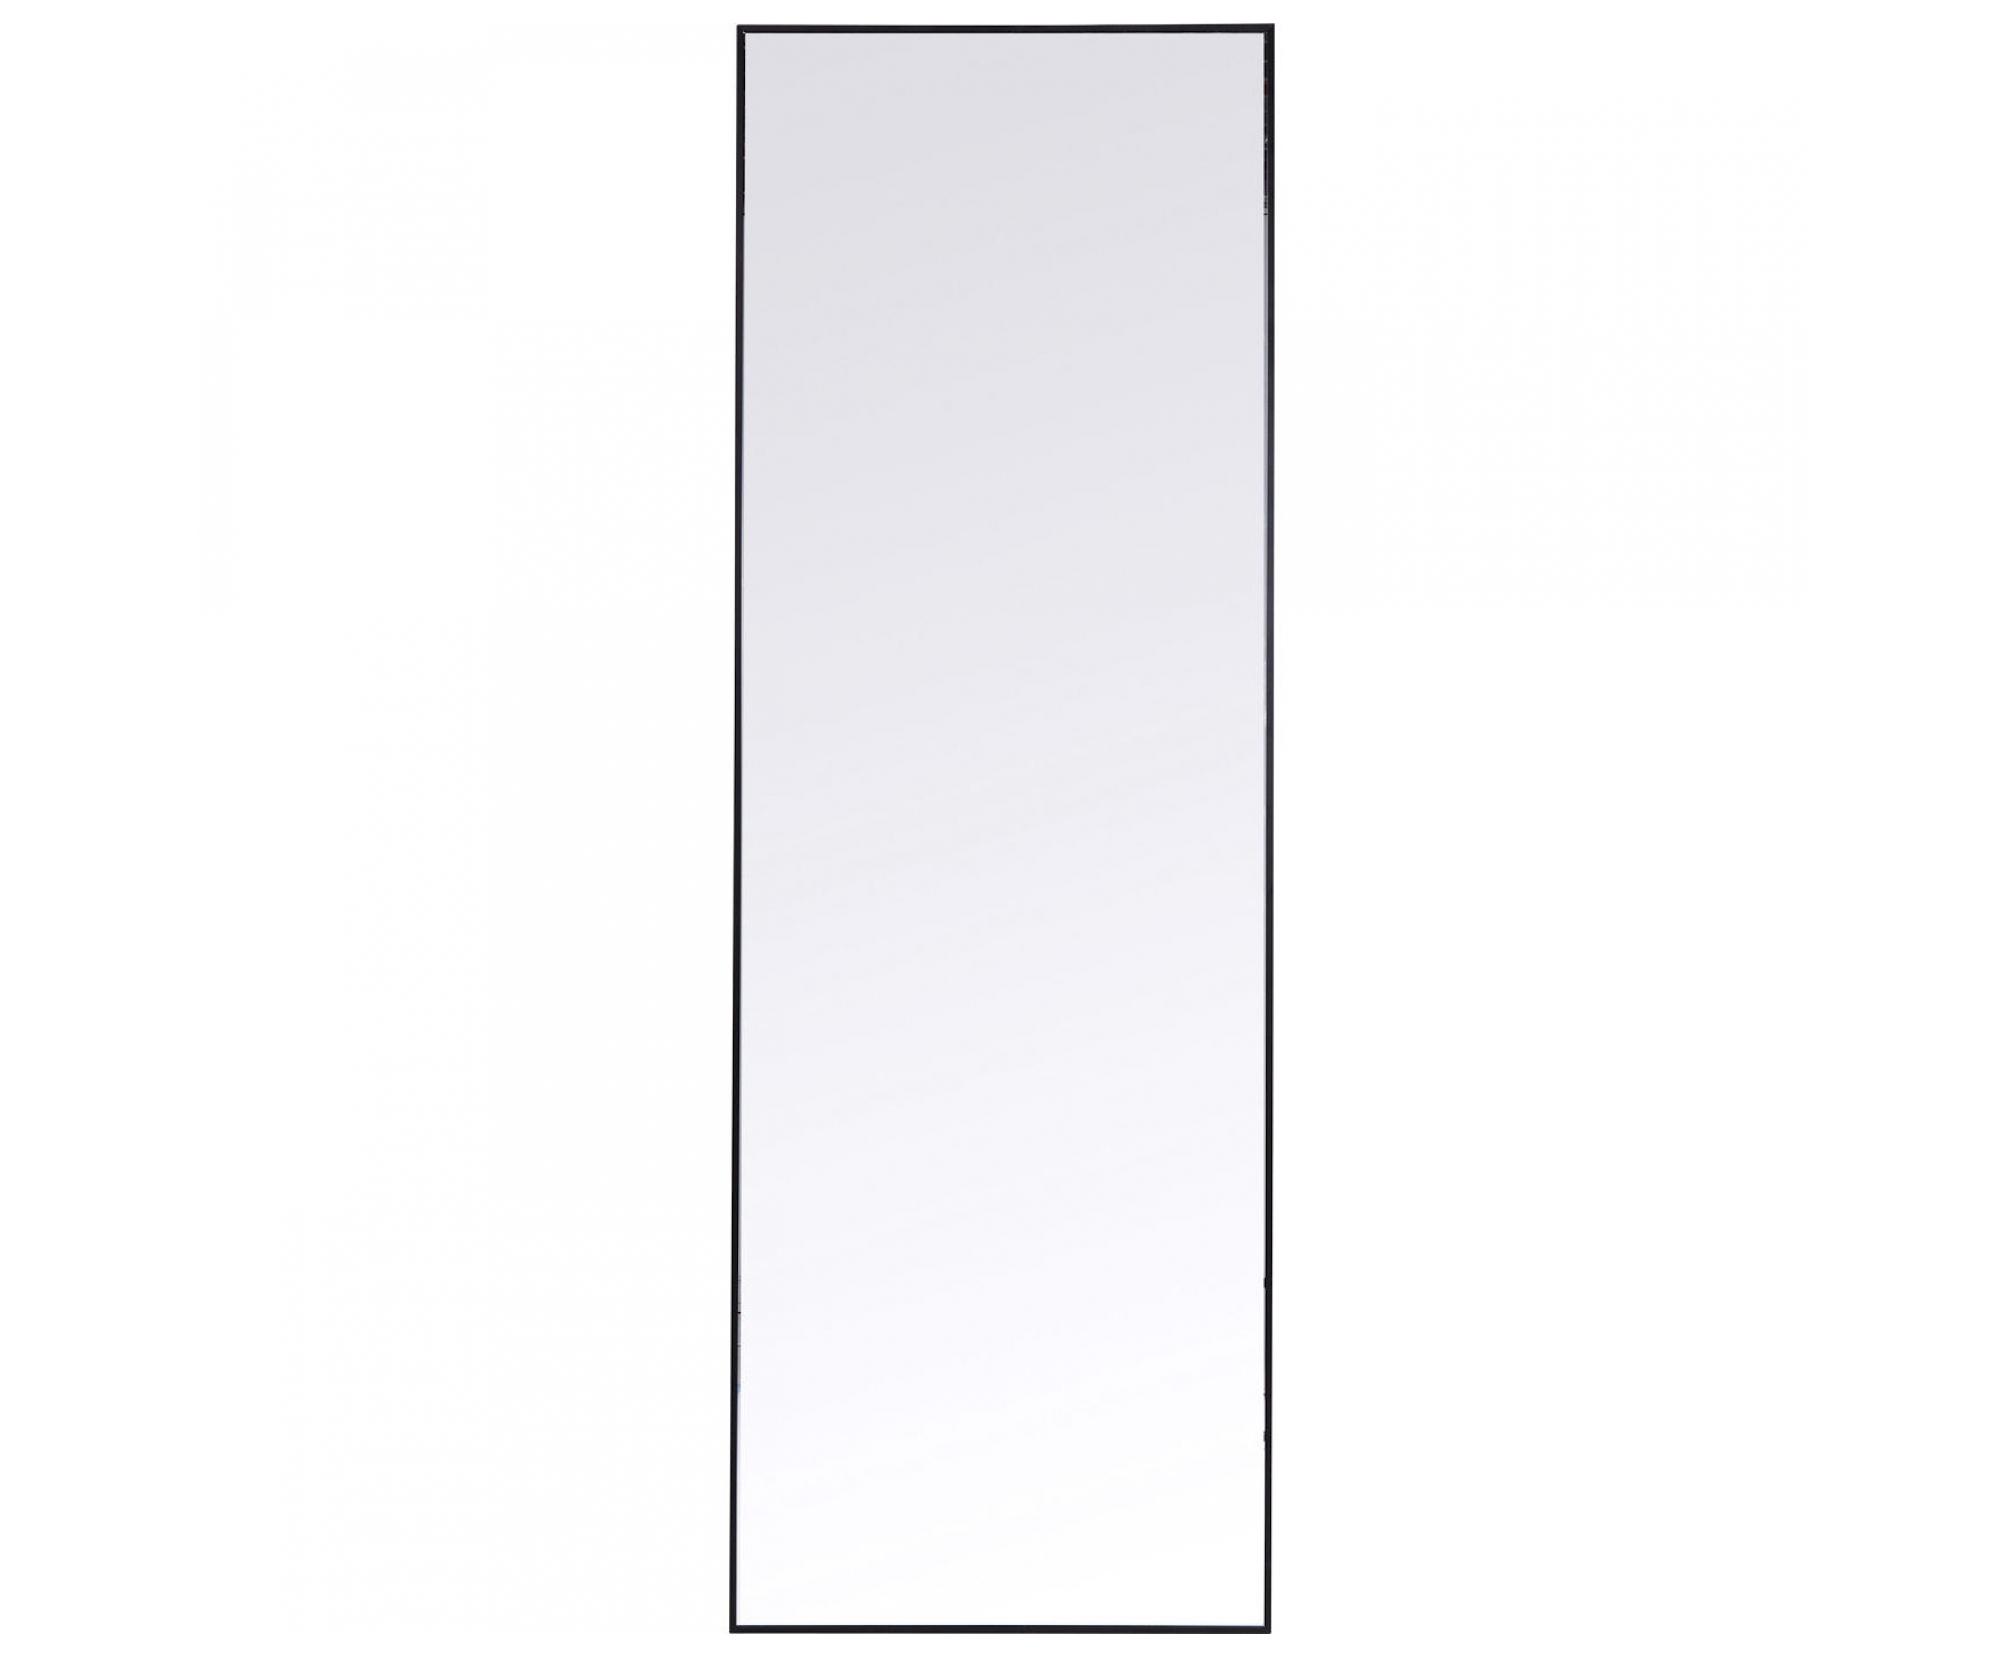 Kadeřnické zrcadlo Kare Bella - černé, 130 x 30 cm (83452) + DÁREK ZDARMA